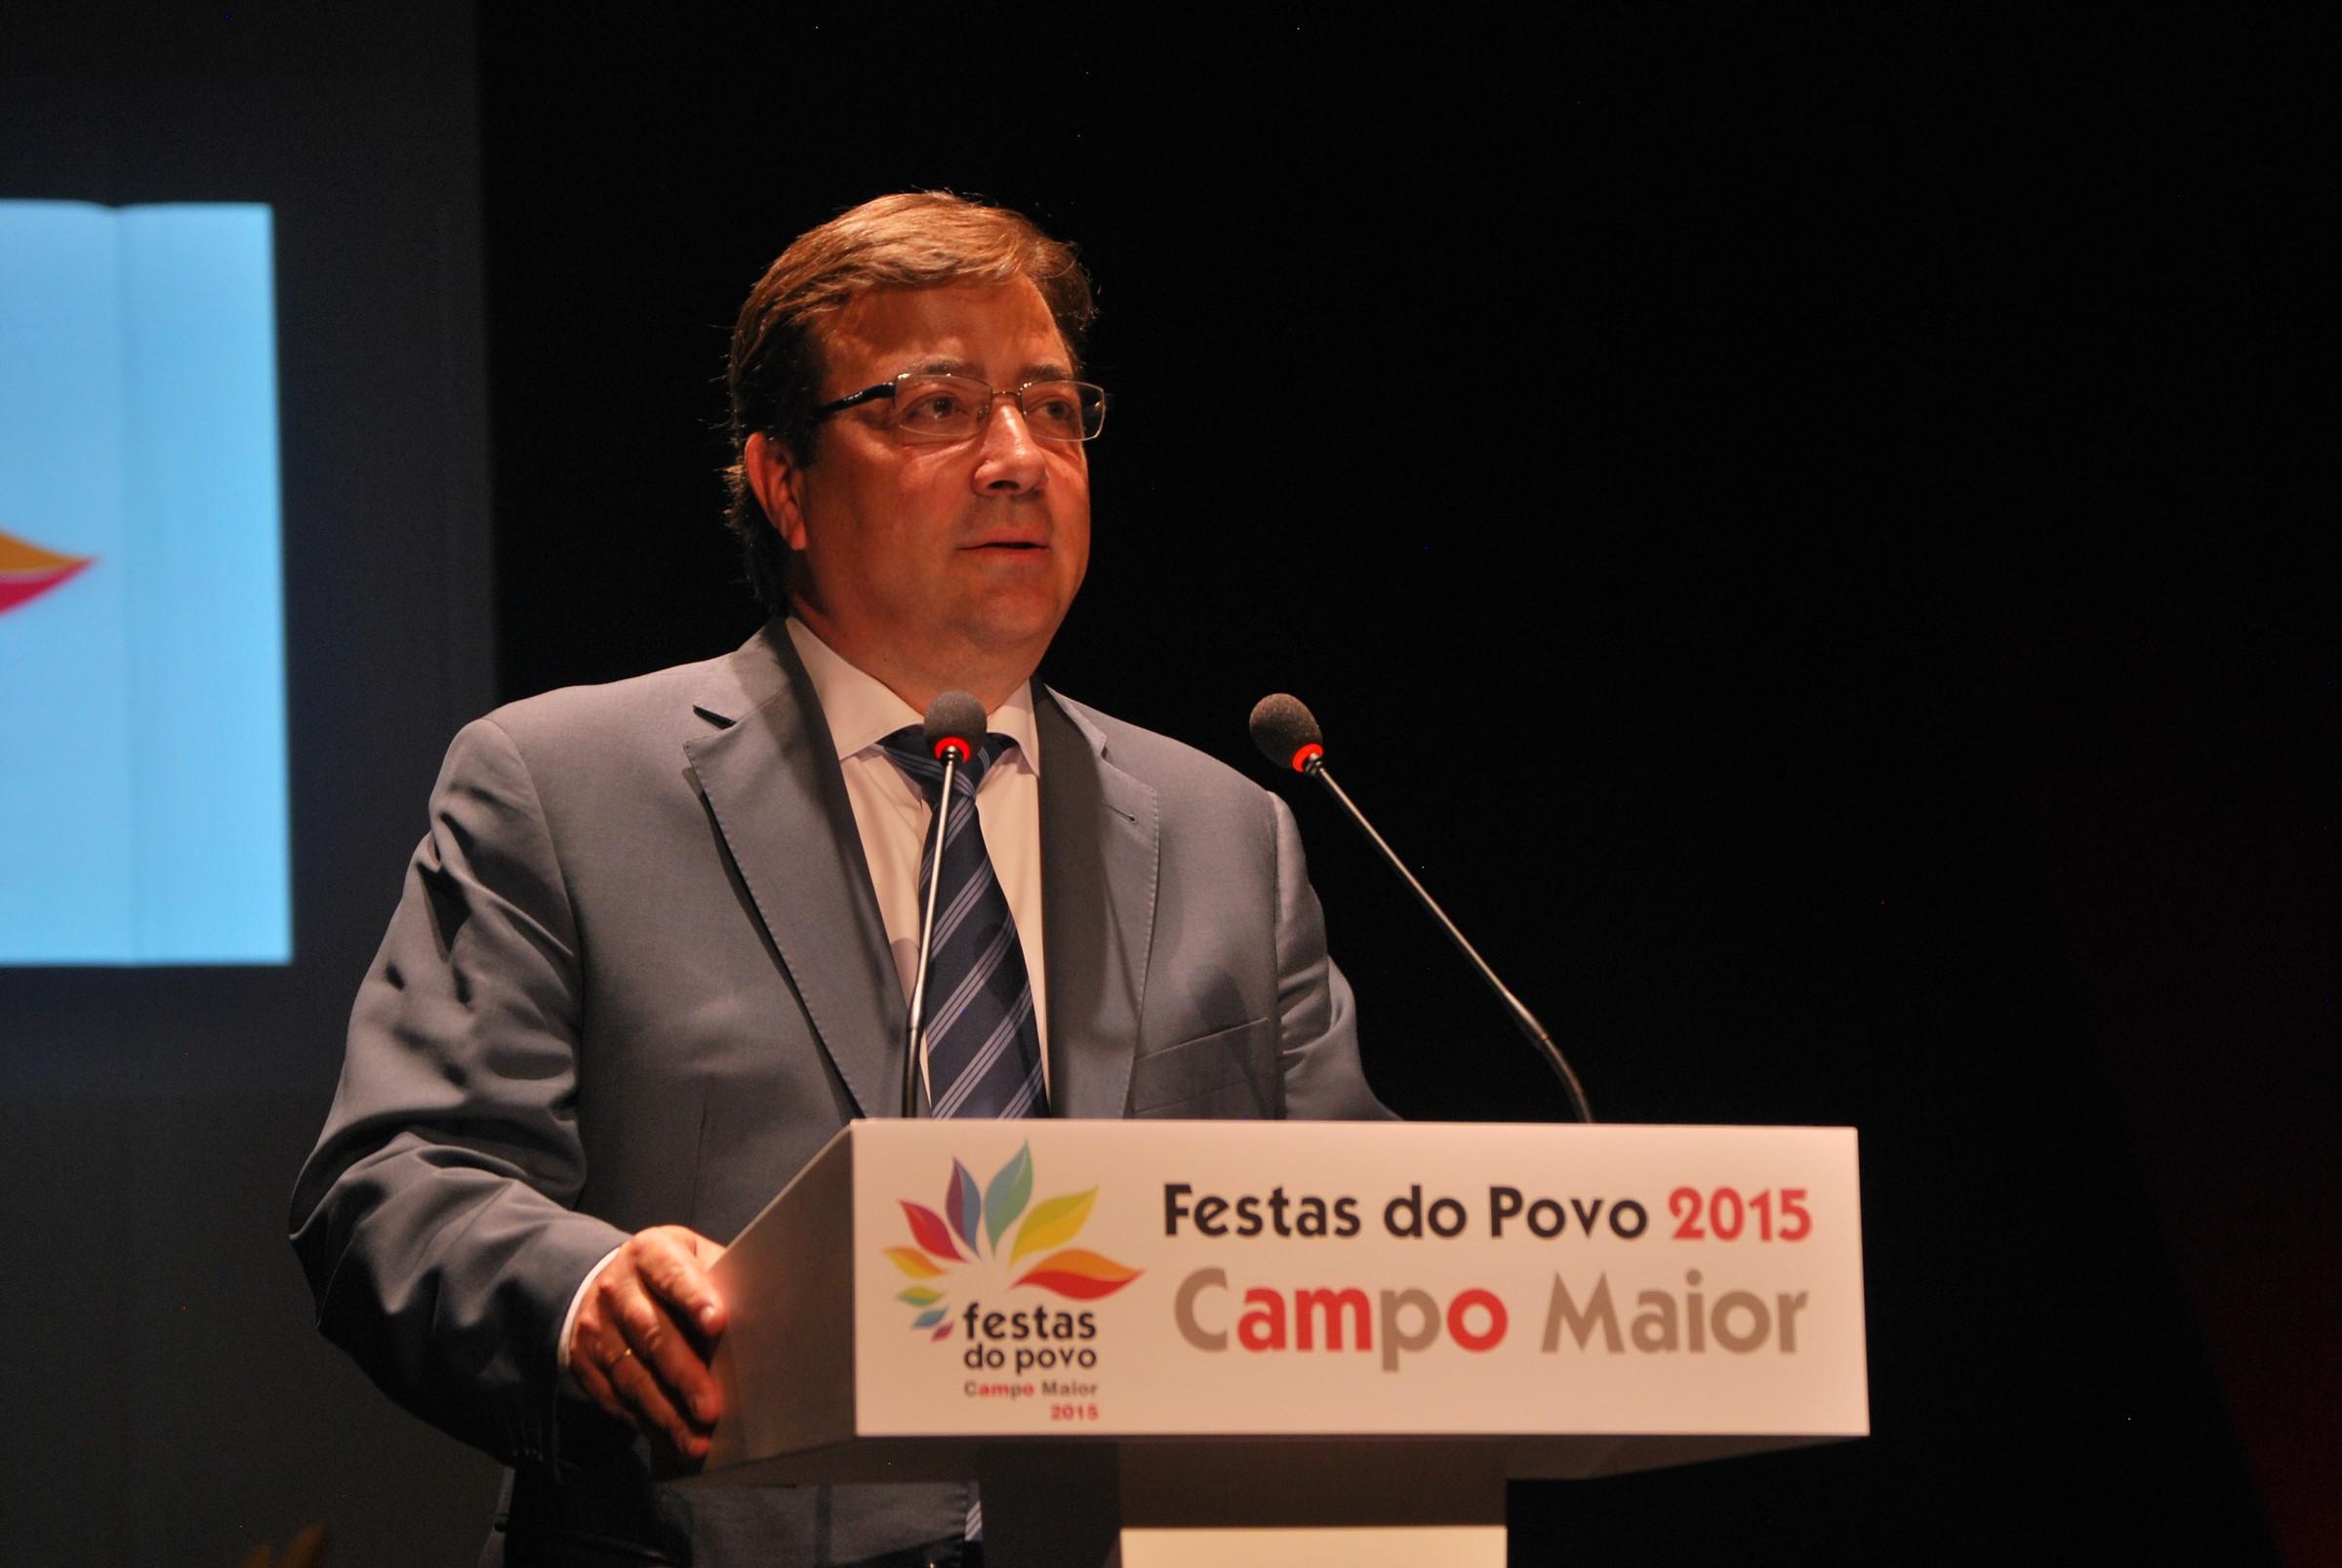 Guillermo Fernández Vara, Presidente da Junta da Extremadura